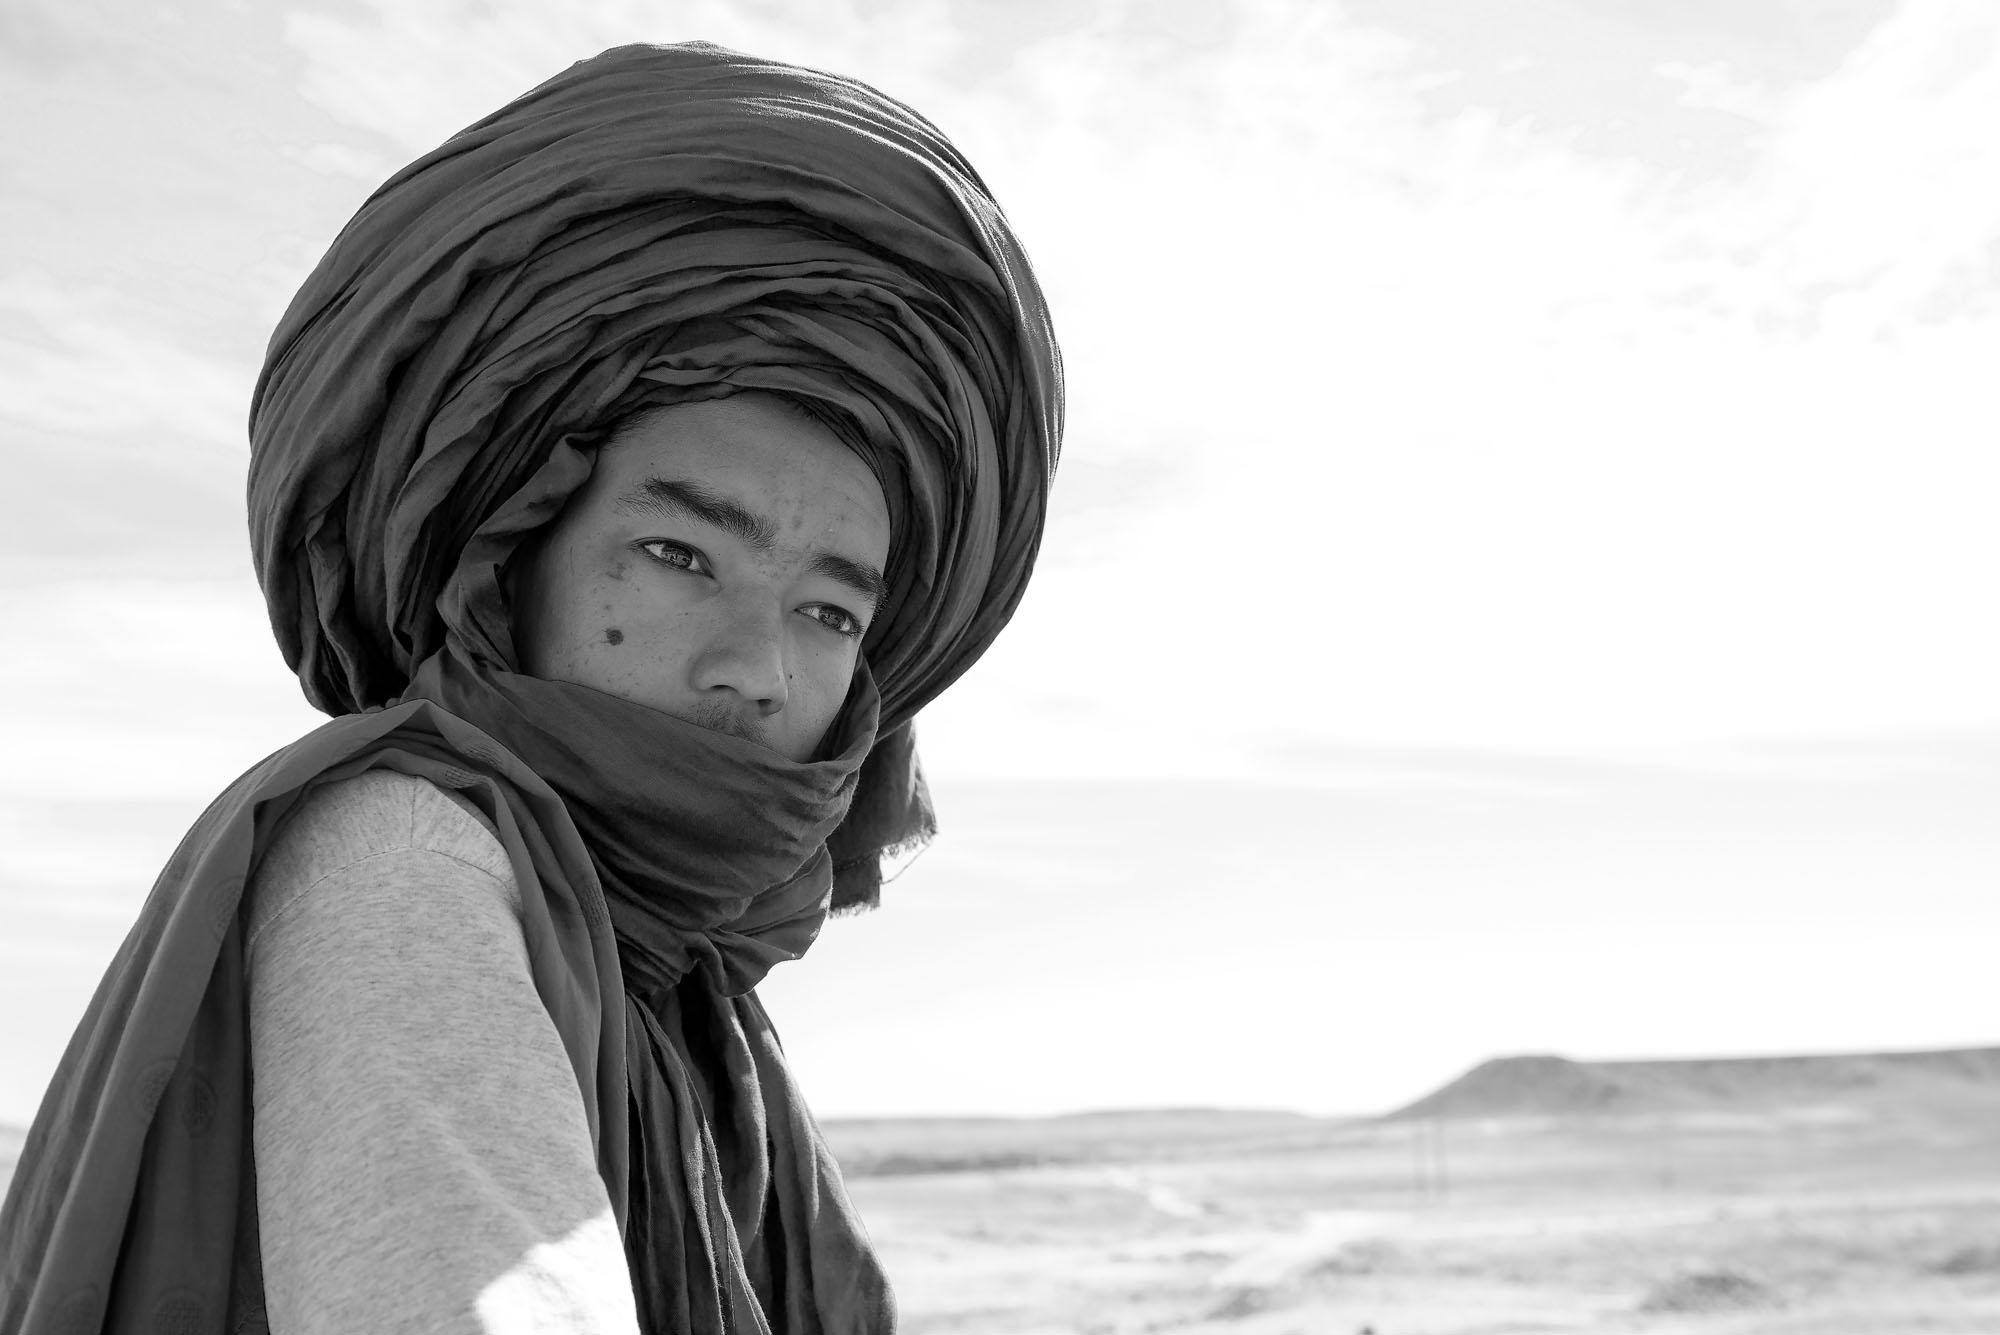 Giovane berbero